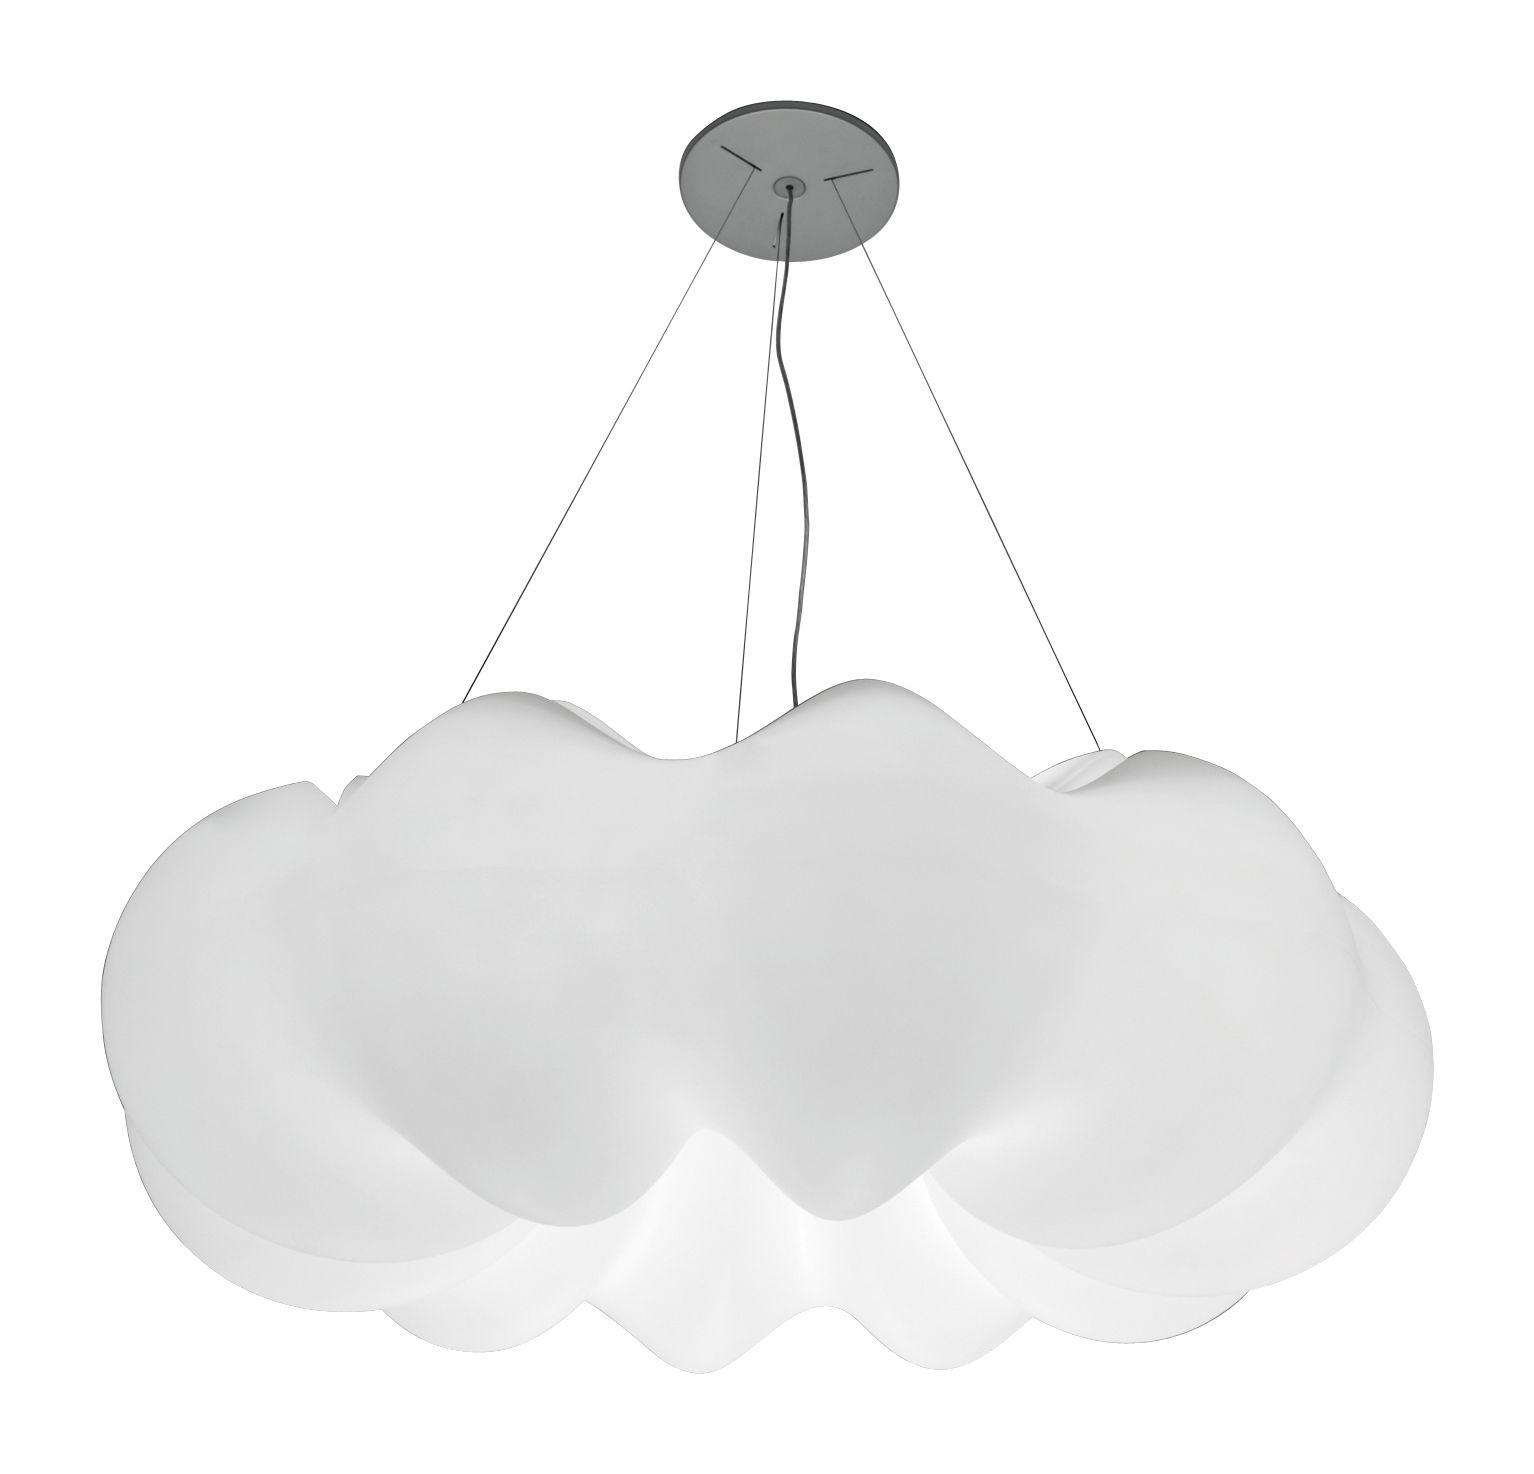 Lighting - Pendant Lighting - Nuboli Pendant - Ø 153 cm by Artemide - White - roto-moulded polyhene